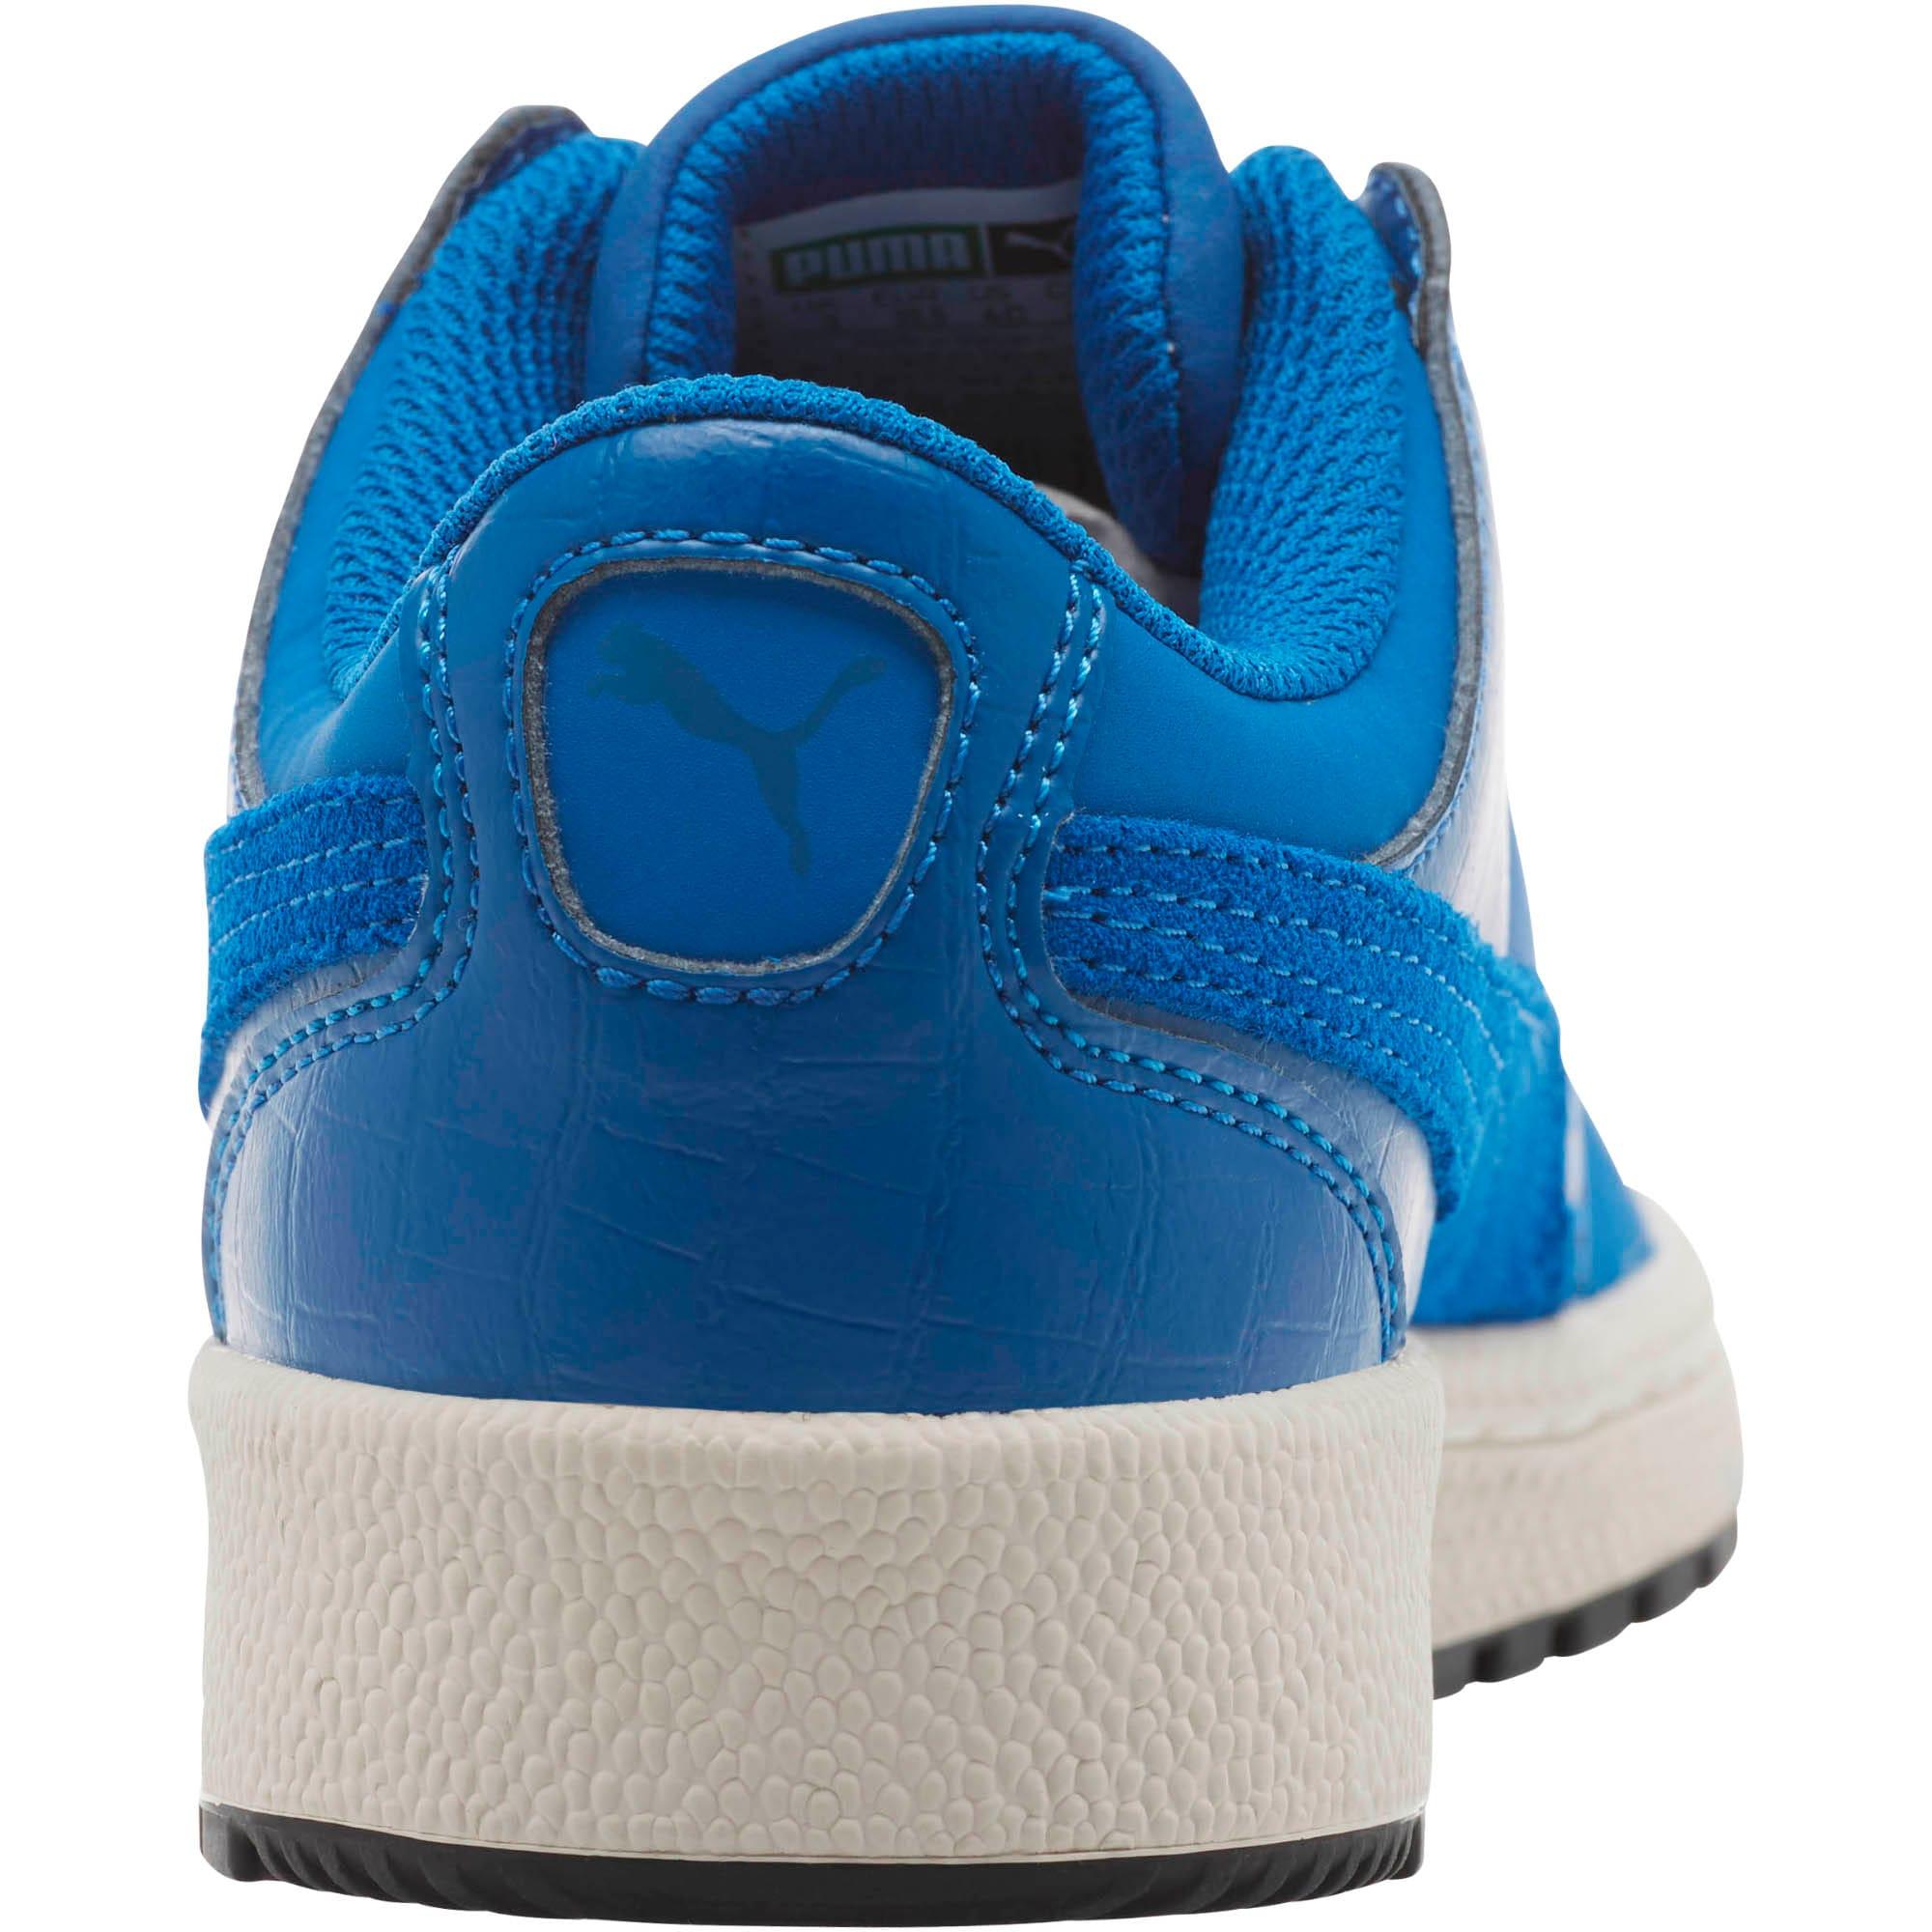 M Us Big Kid Sports Flywire Knitting Jogging Shoes For Boys Girls,Print Jellyfish 2 B